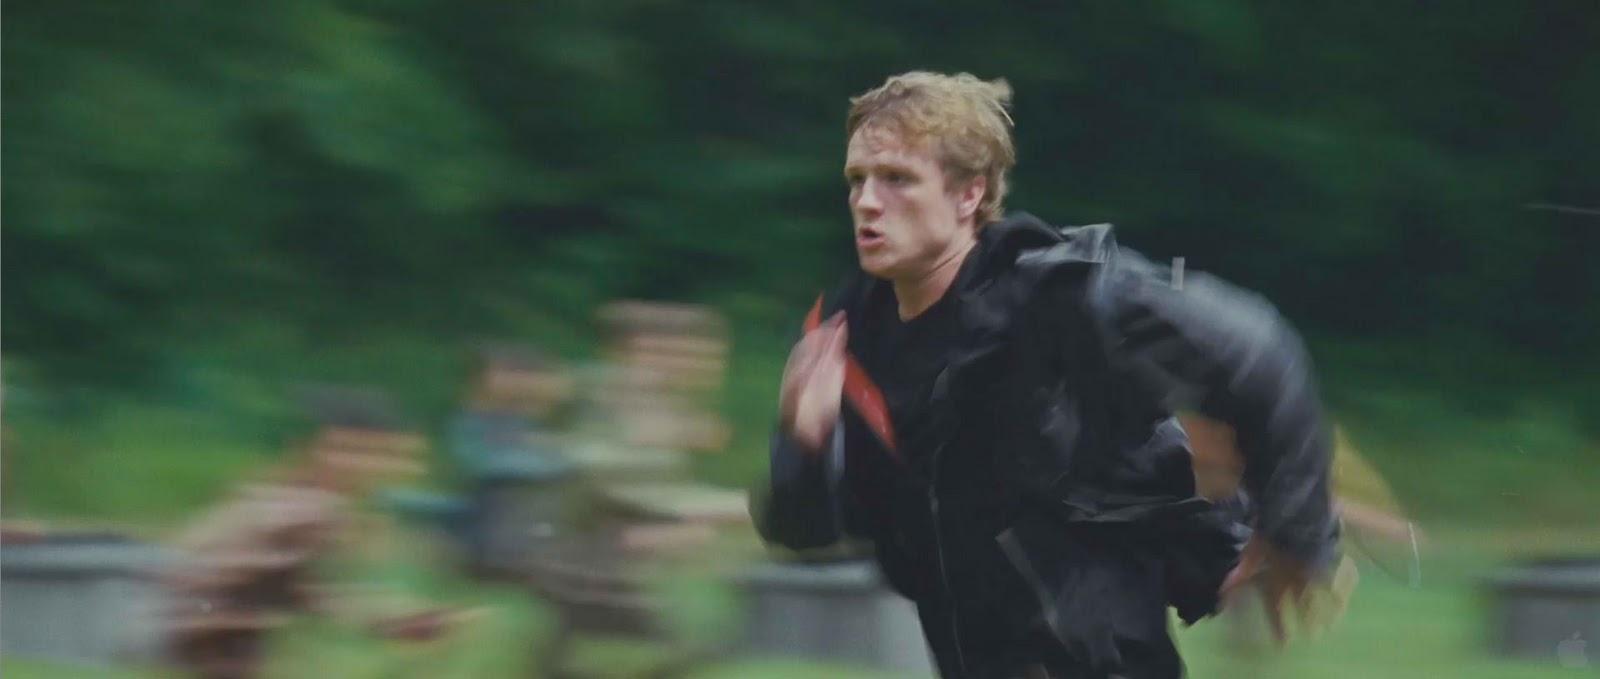 How to Dress Like Katniss, Peeta, Gale, Prim in The Hunger ...